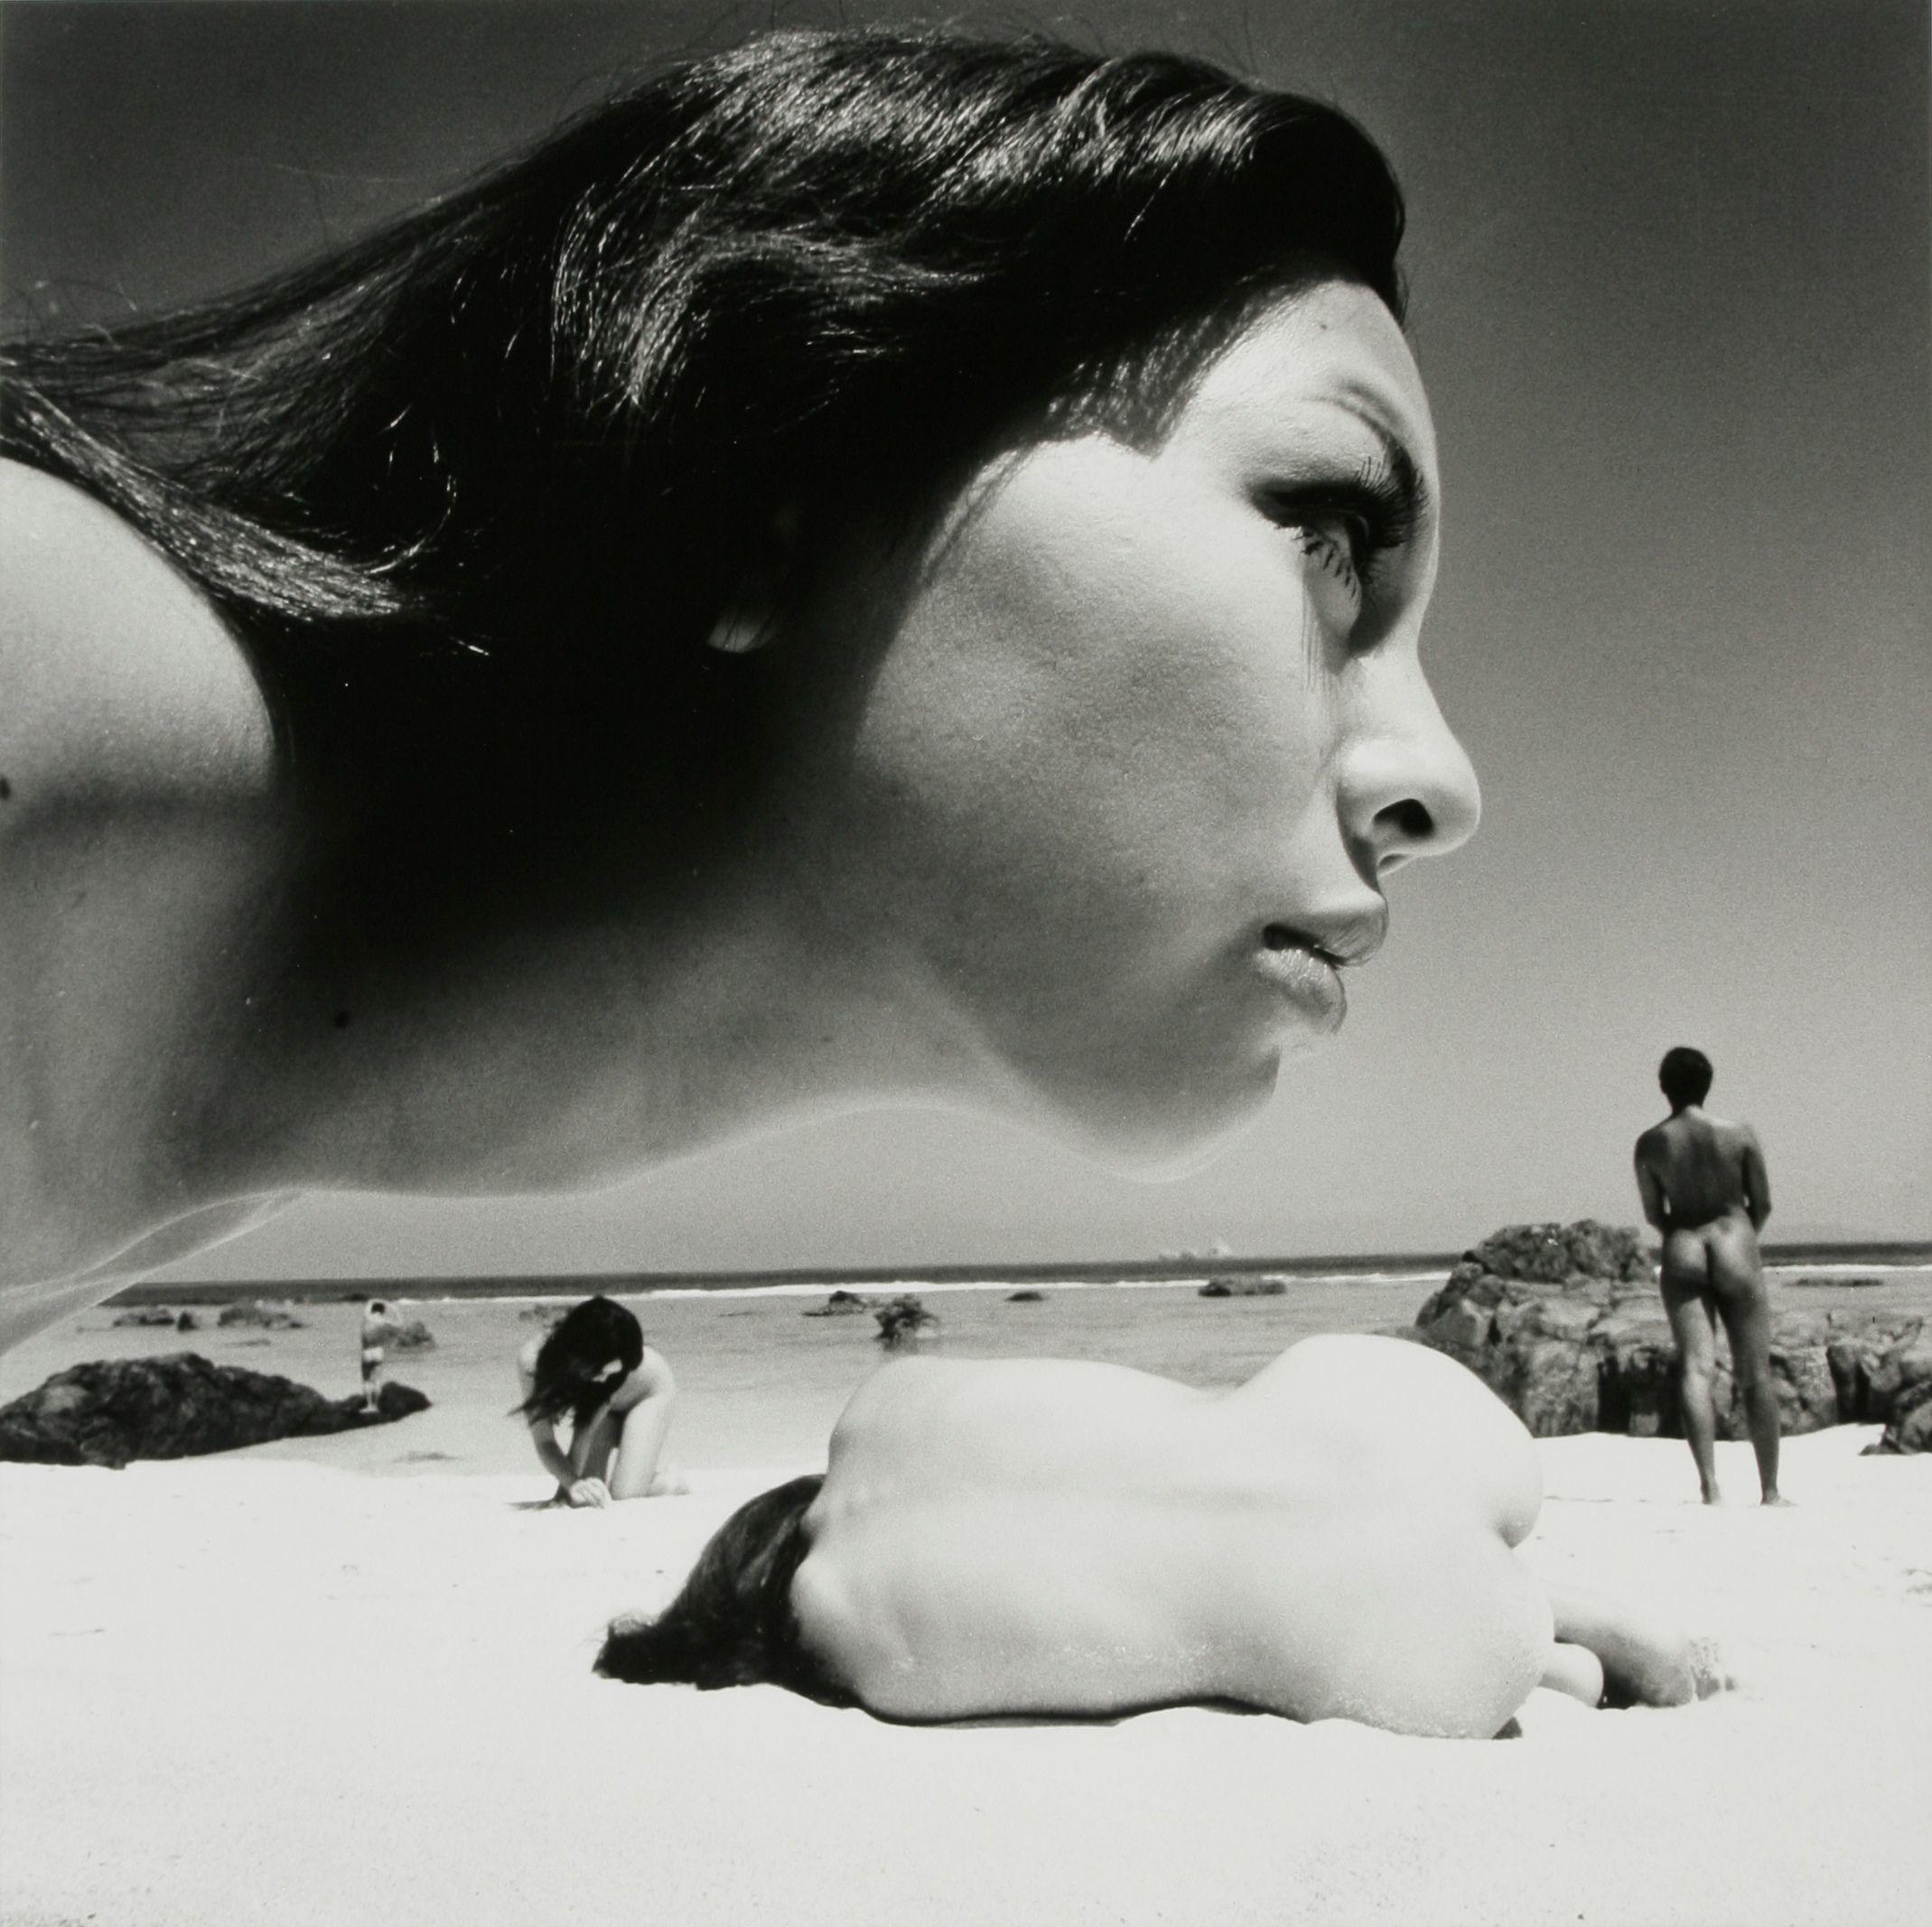 篠山紀信(日本、1940) 《誕生》1968年 (C)Kishin Shinoyama